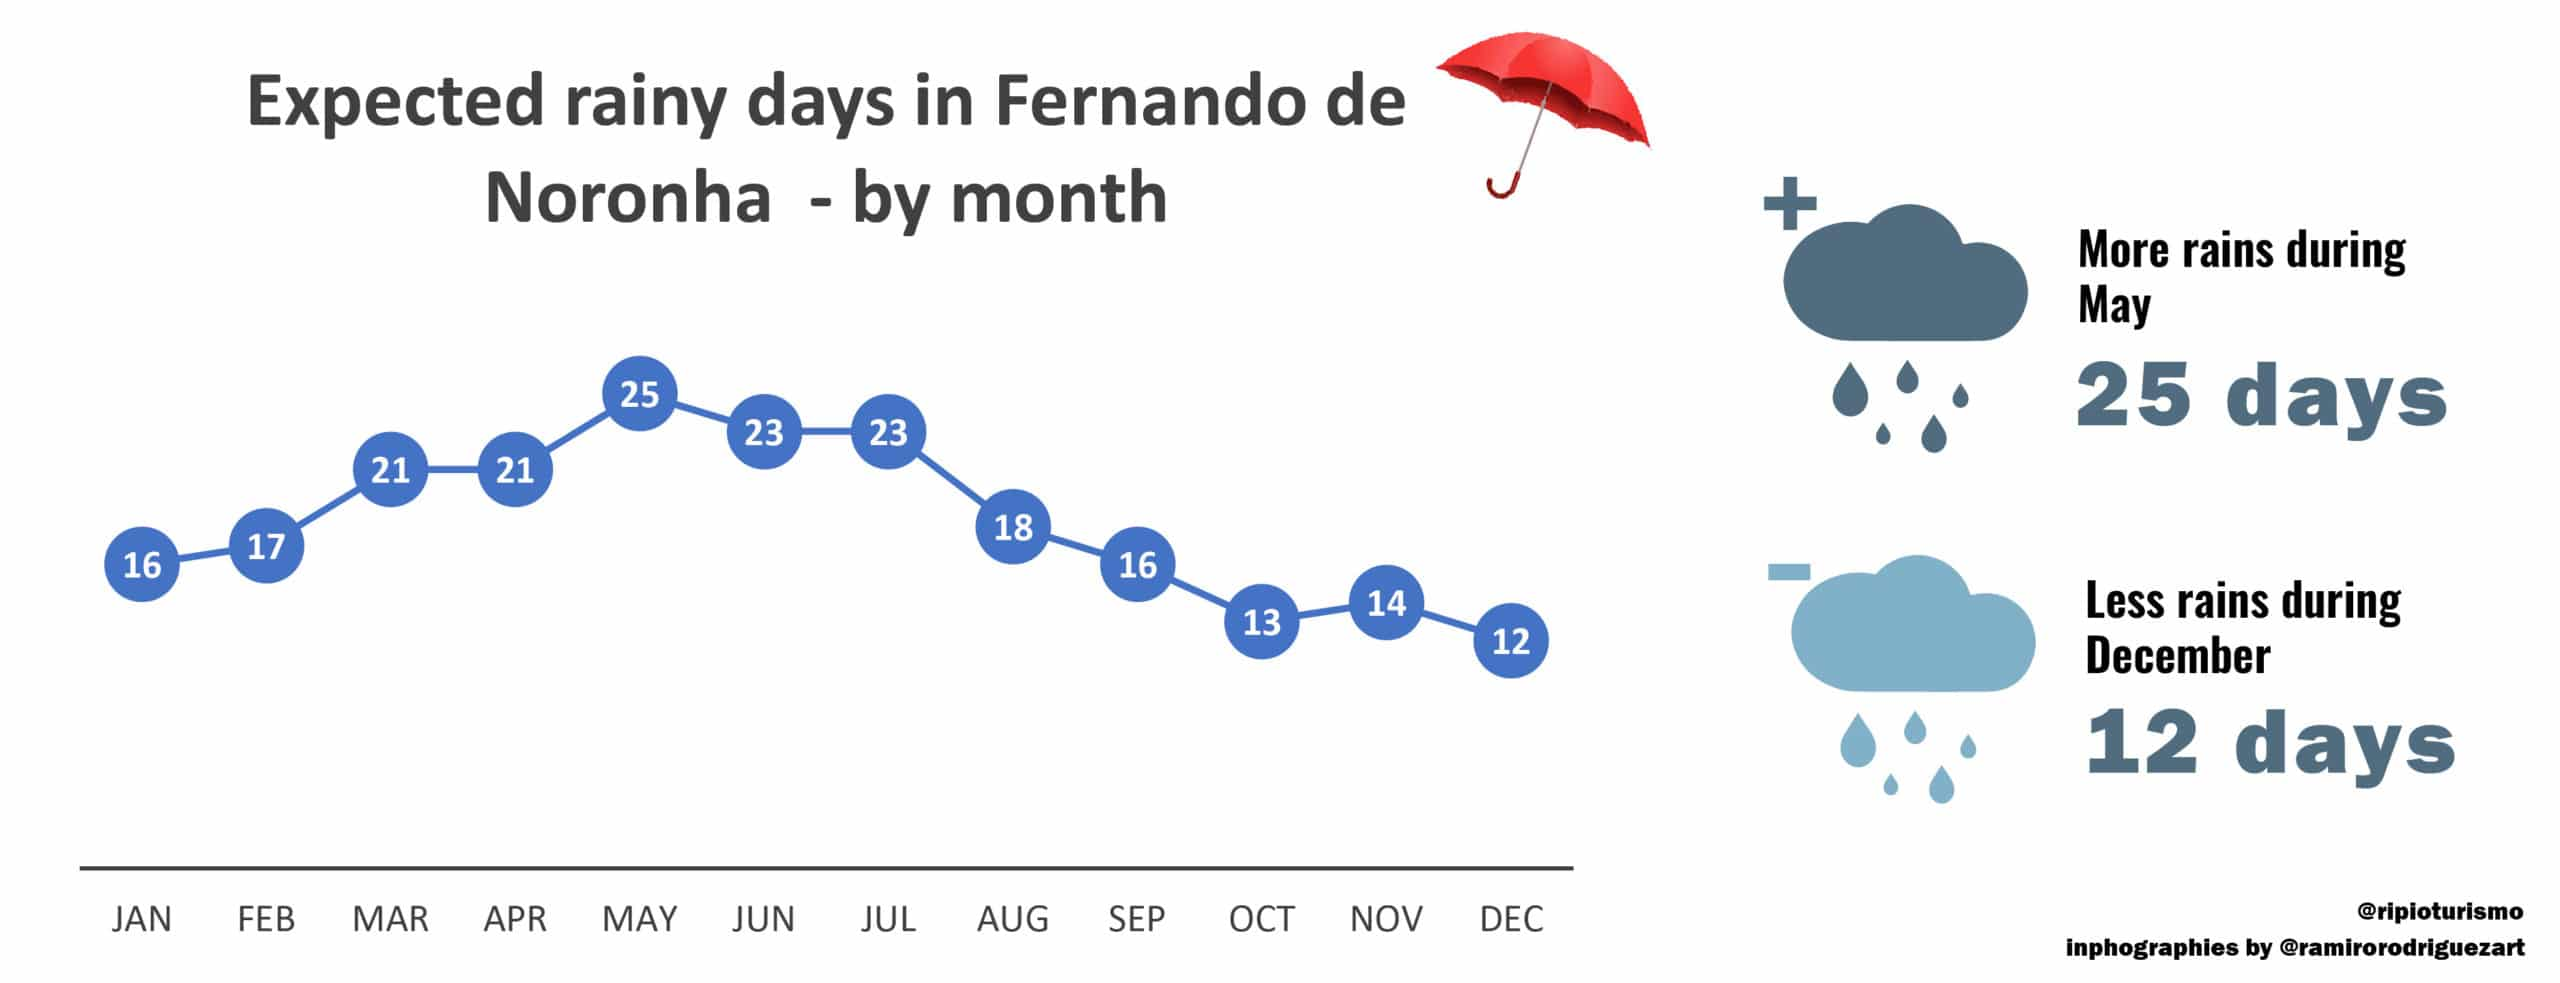 Rainy days in Fernando de Noronha, month by mont - RipioTurismo DMC for Brazil